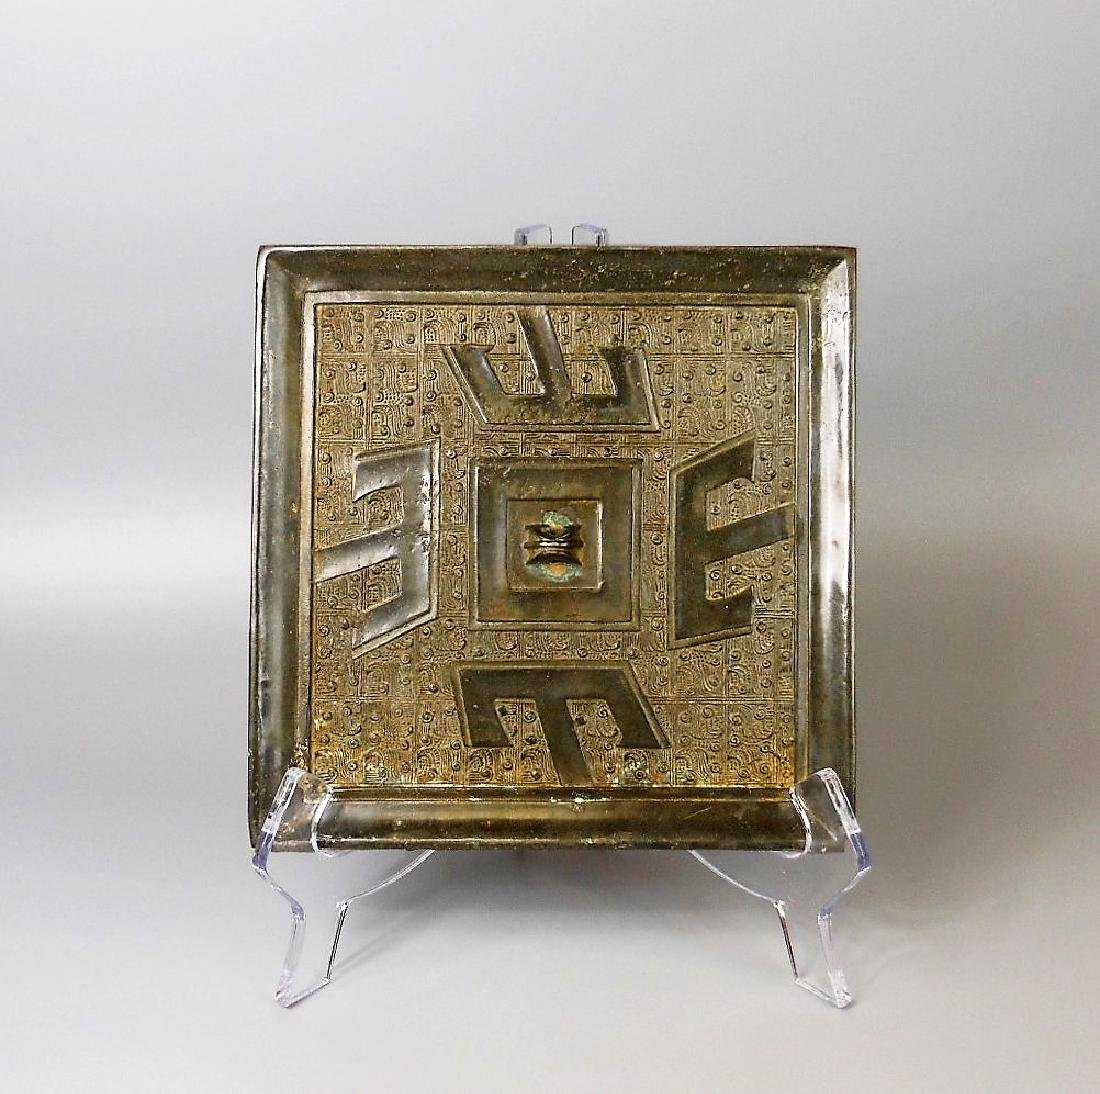 A Chinese archaic bronze mirror